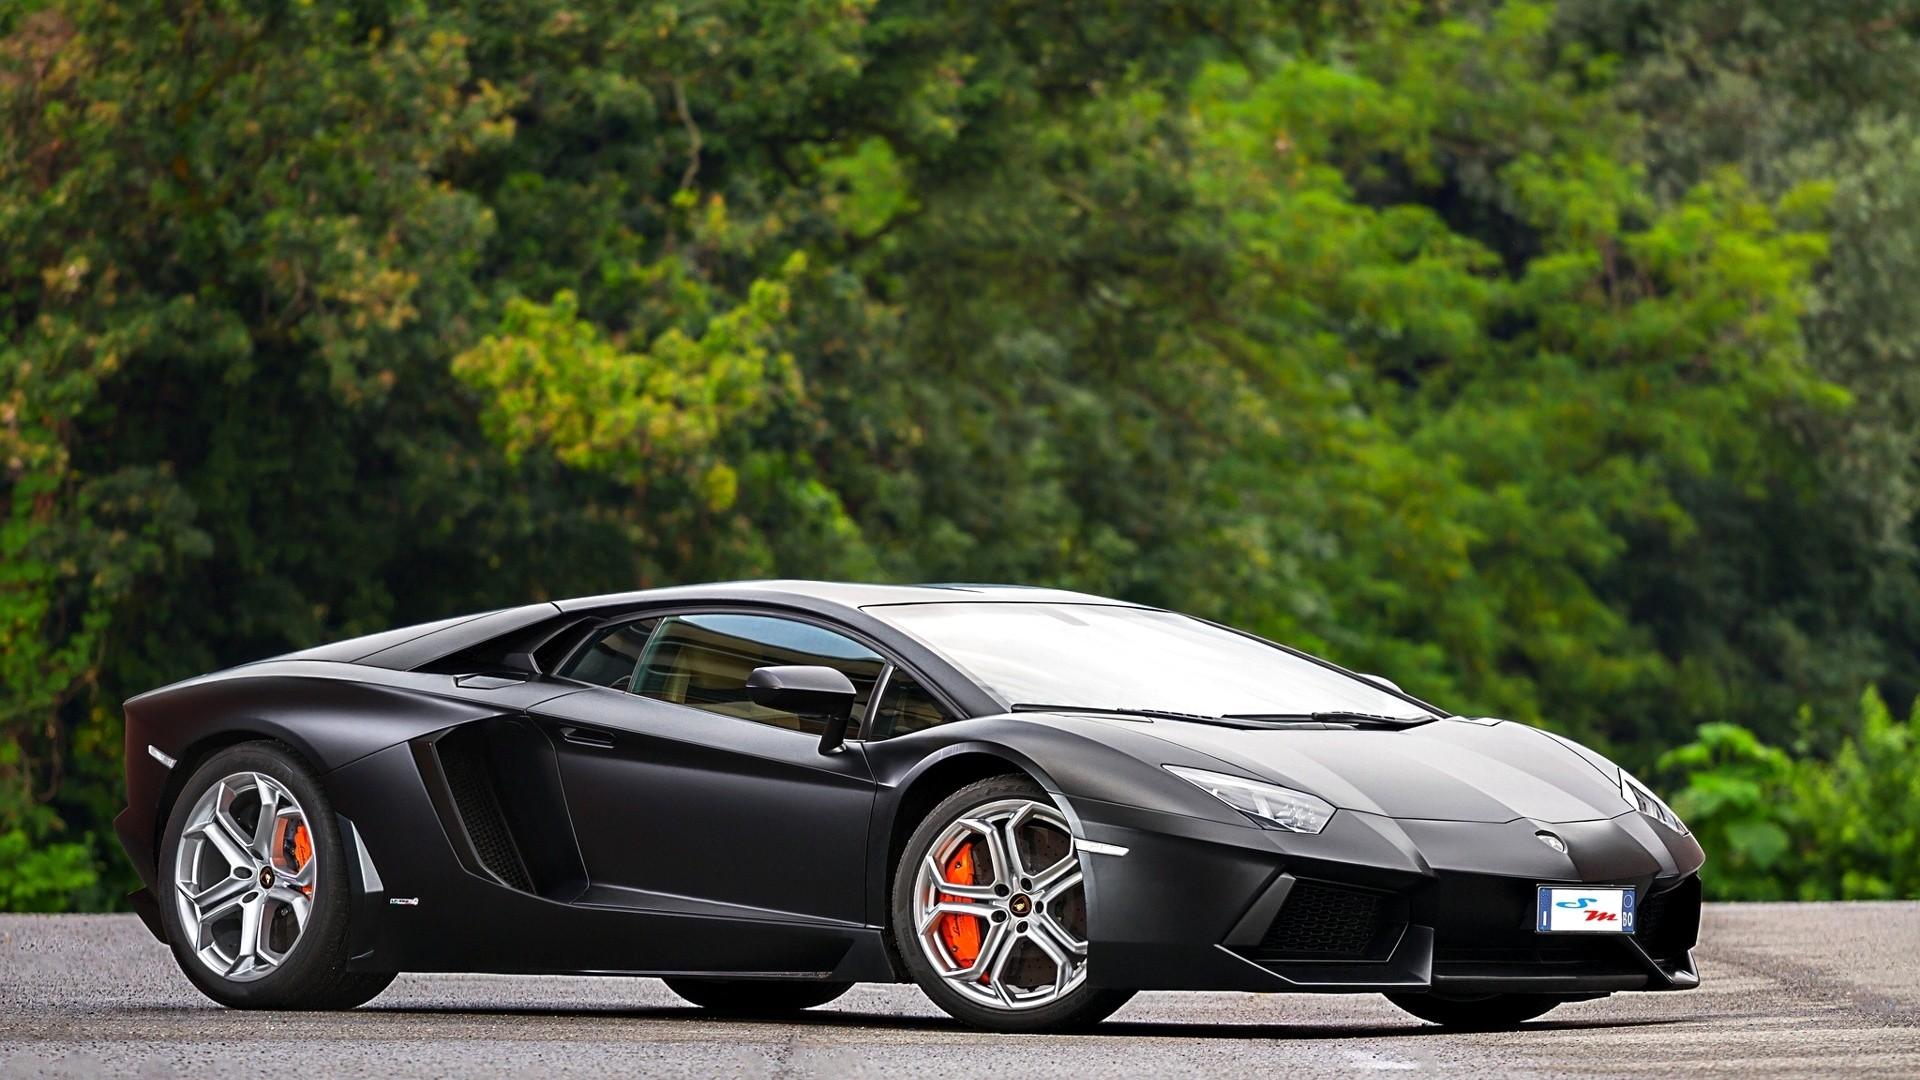 Lamborghini Cars Wallpaper 78 Images